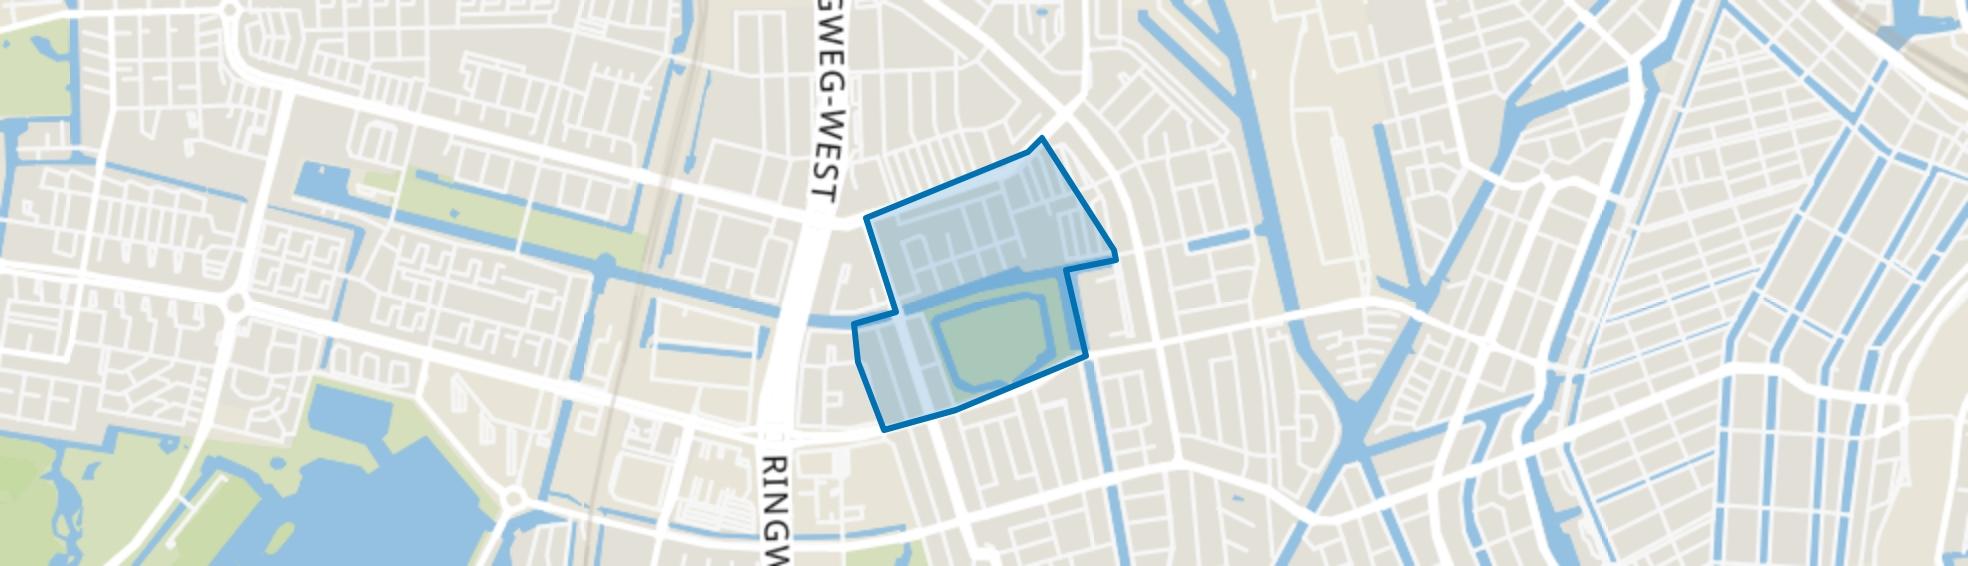 Erasmuspark, Amsterdam map